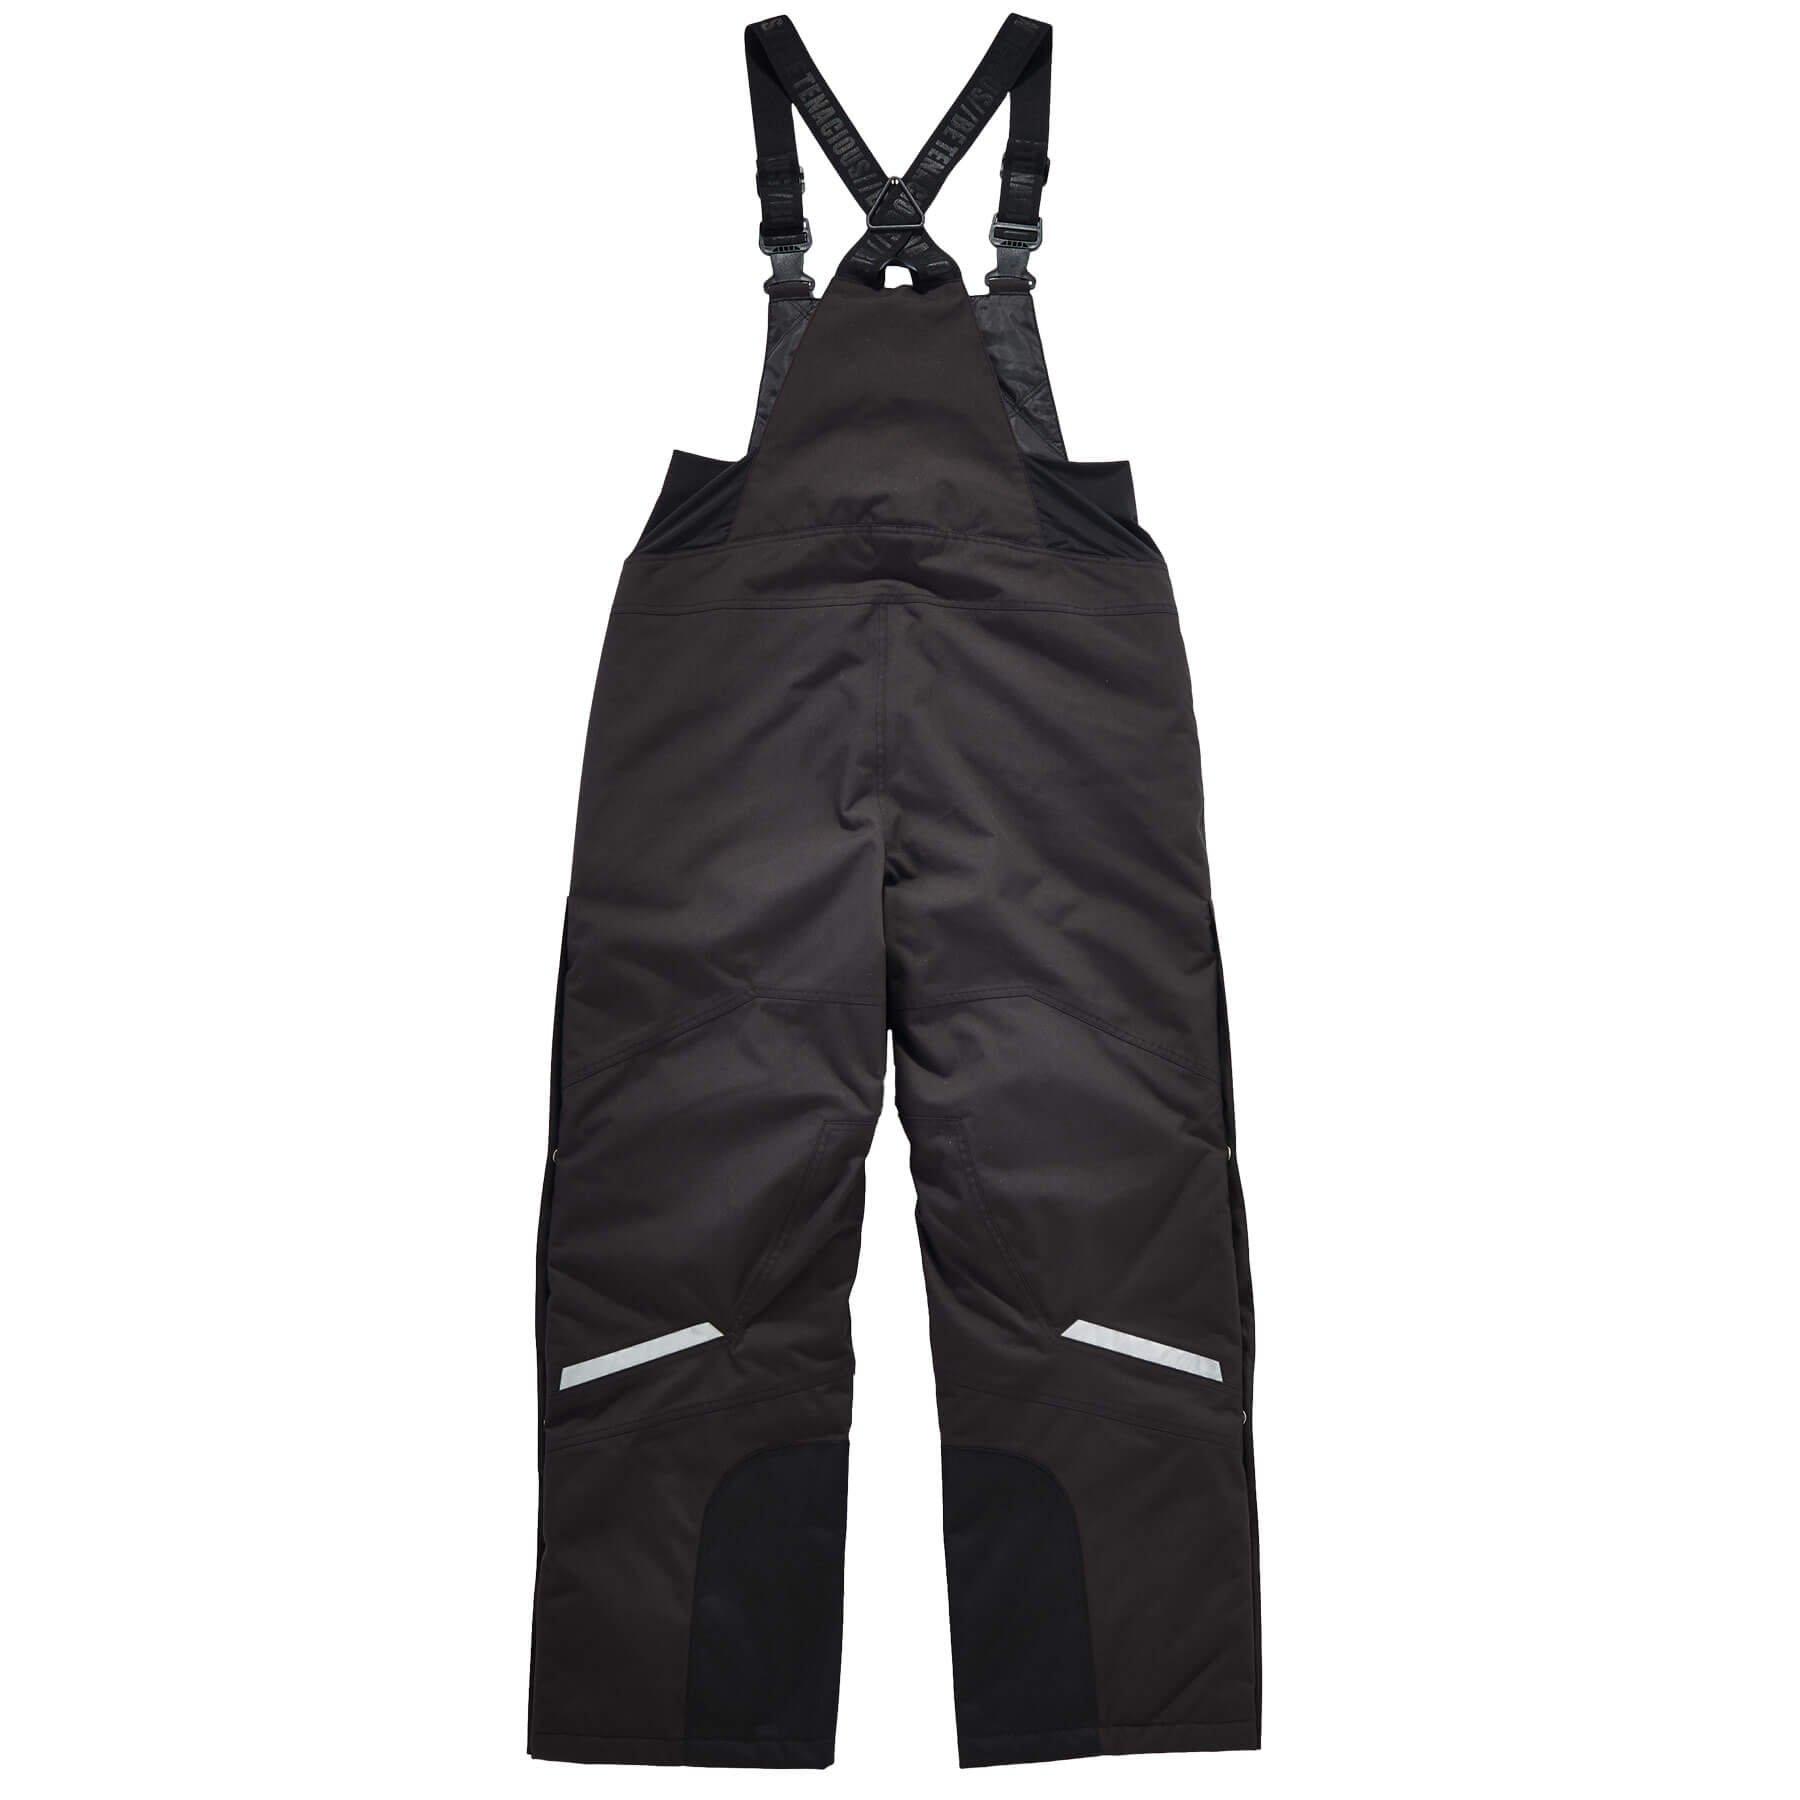 Ergodyne N-Ferno 6471 Men's Winter Thermal Work Bib Overalls, Black, Large by Ergodyne (Image #3)